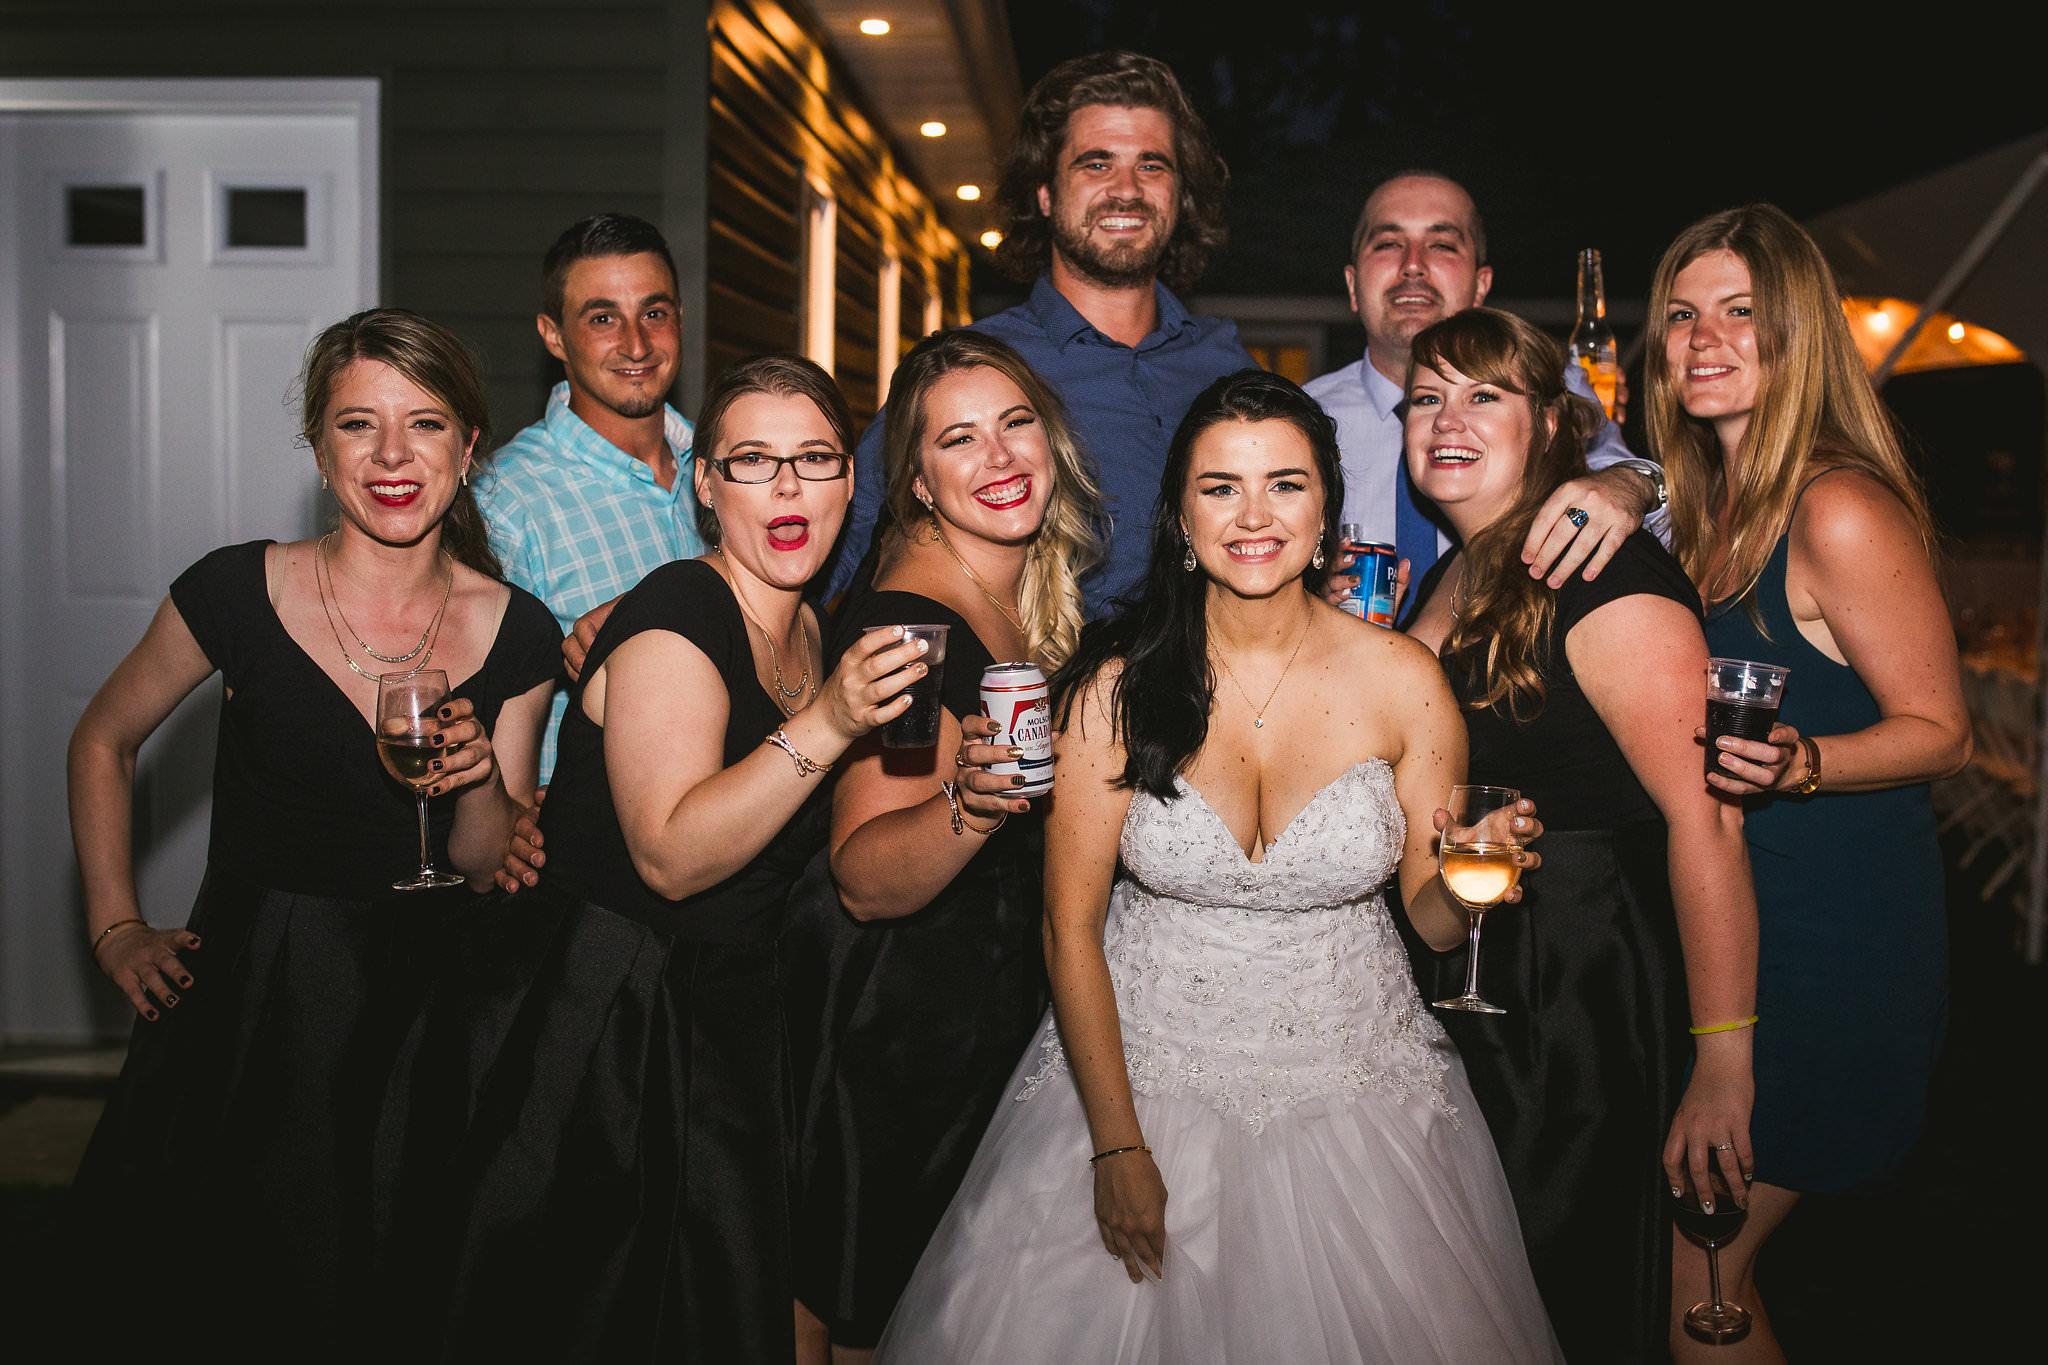 Kristen Adam Kindred Loft Whitby Wedding Photos 627 - Durham Wedding Photographer: Kindred Loft Wedding Photos